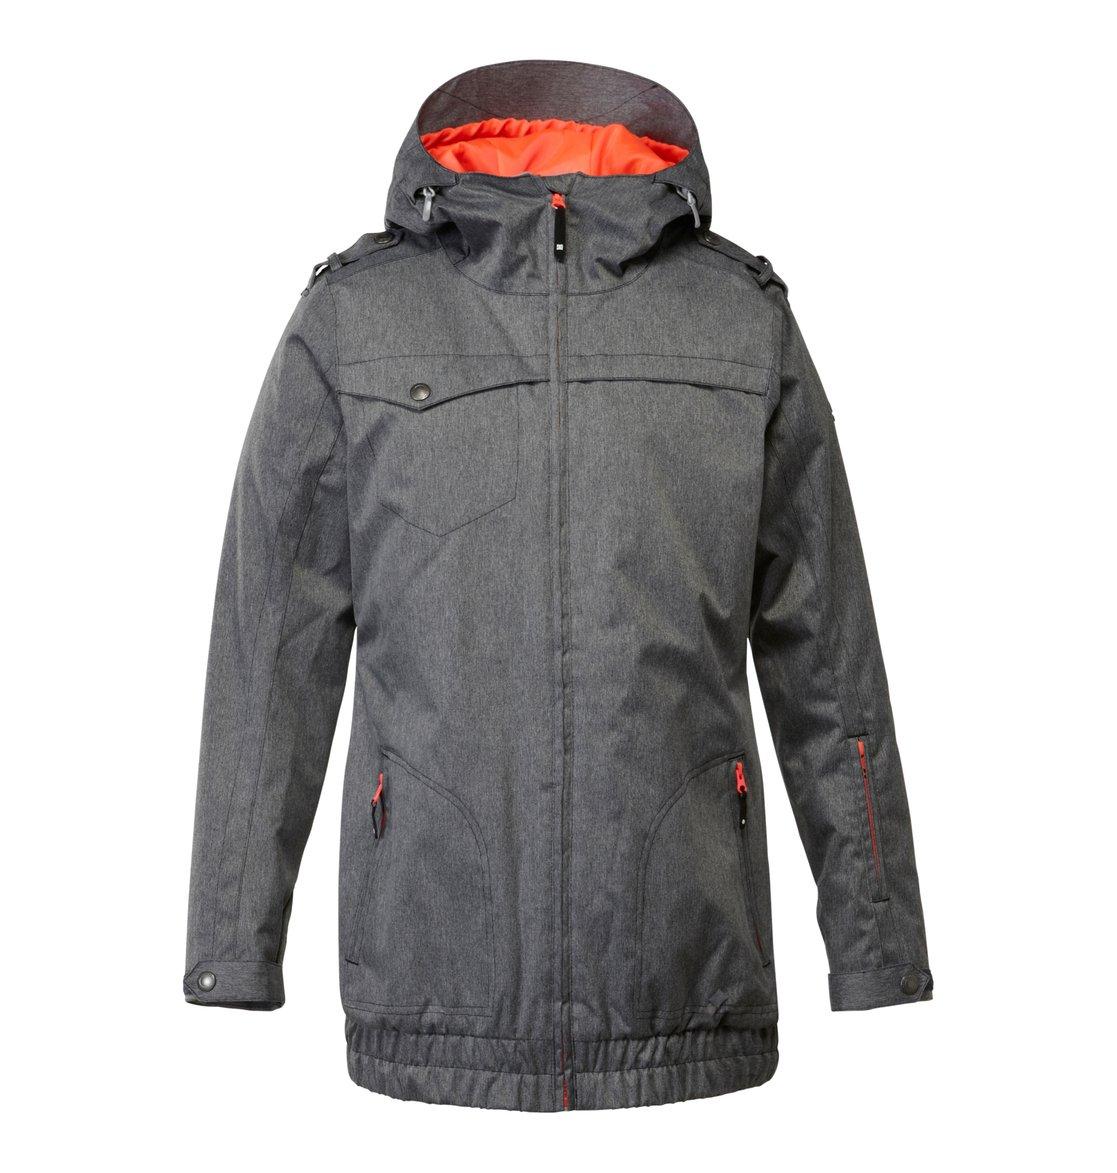 Купить Куртки для сноуборда   Riji 15